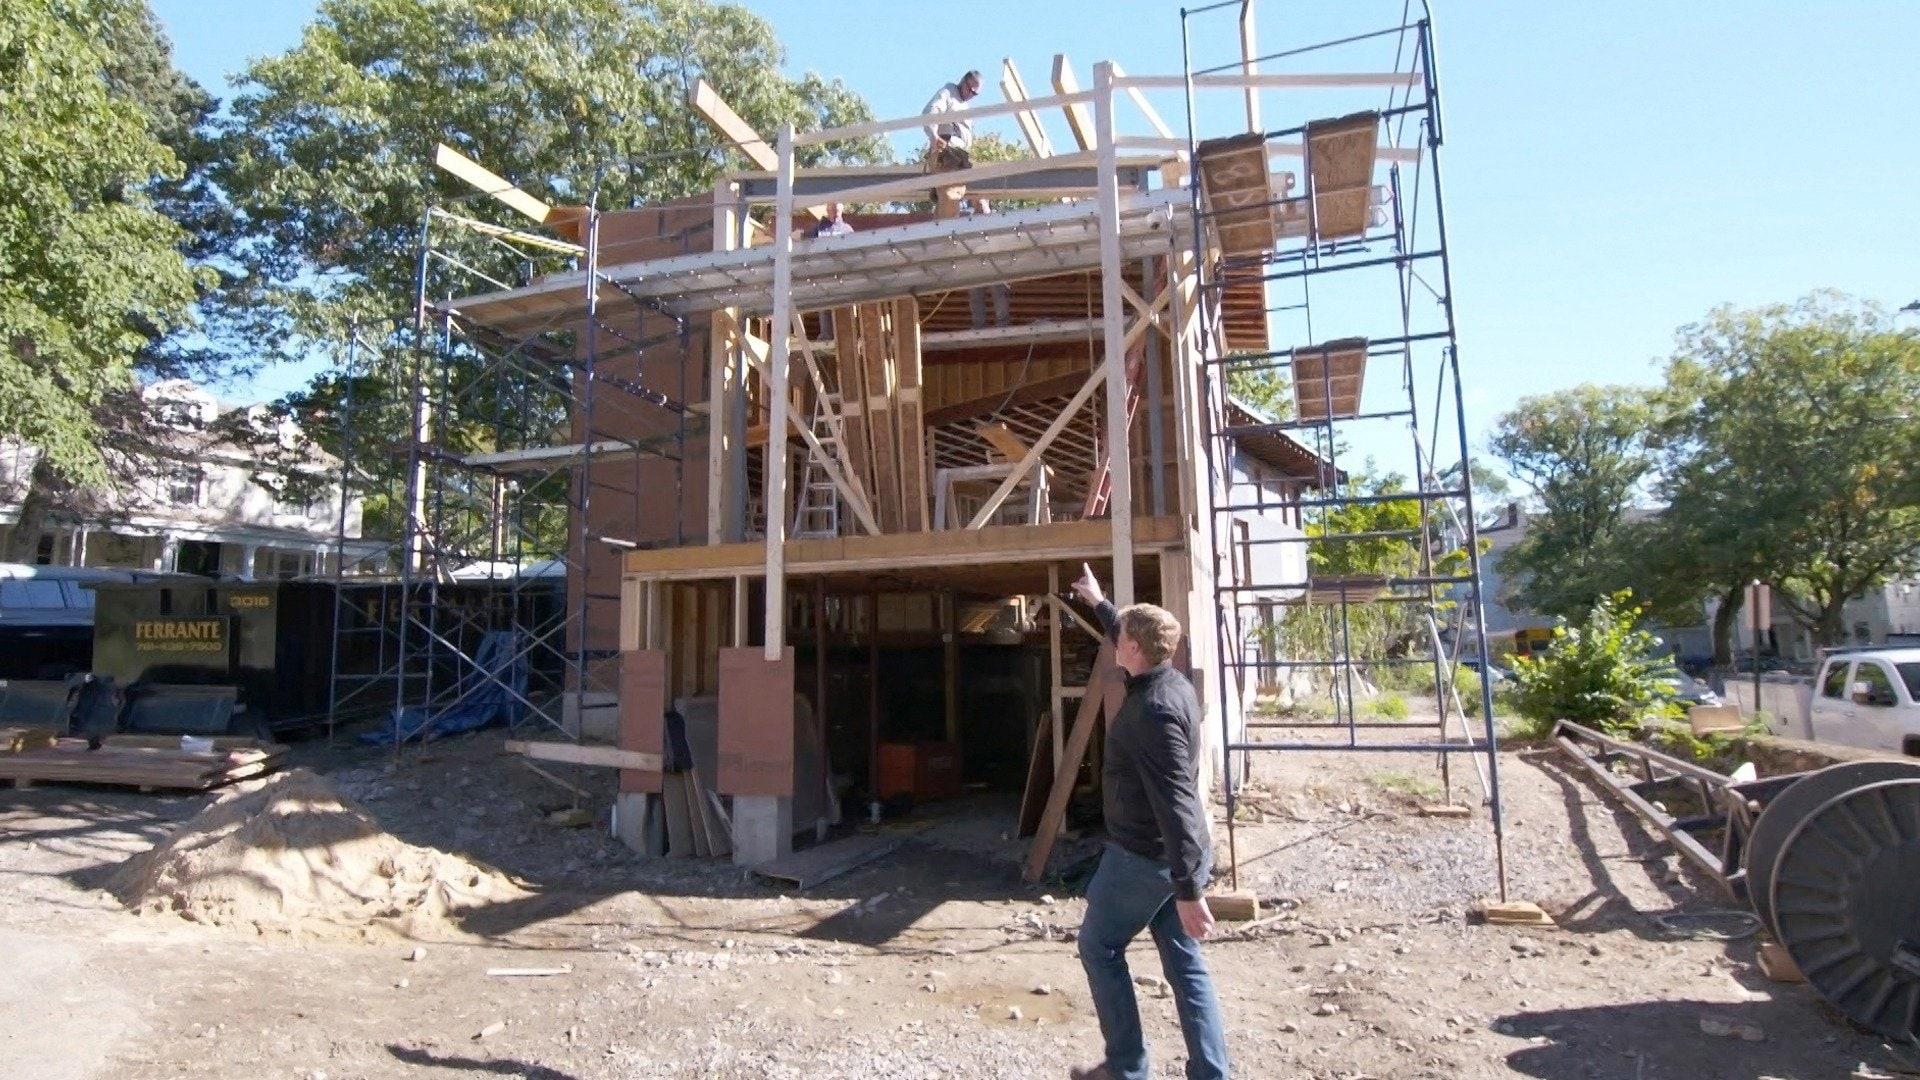 Brookline Mid-century Modern House: Stone Cold Pavers